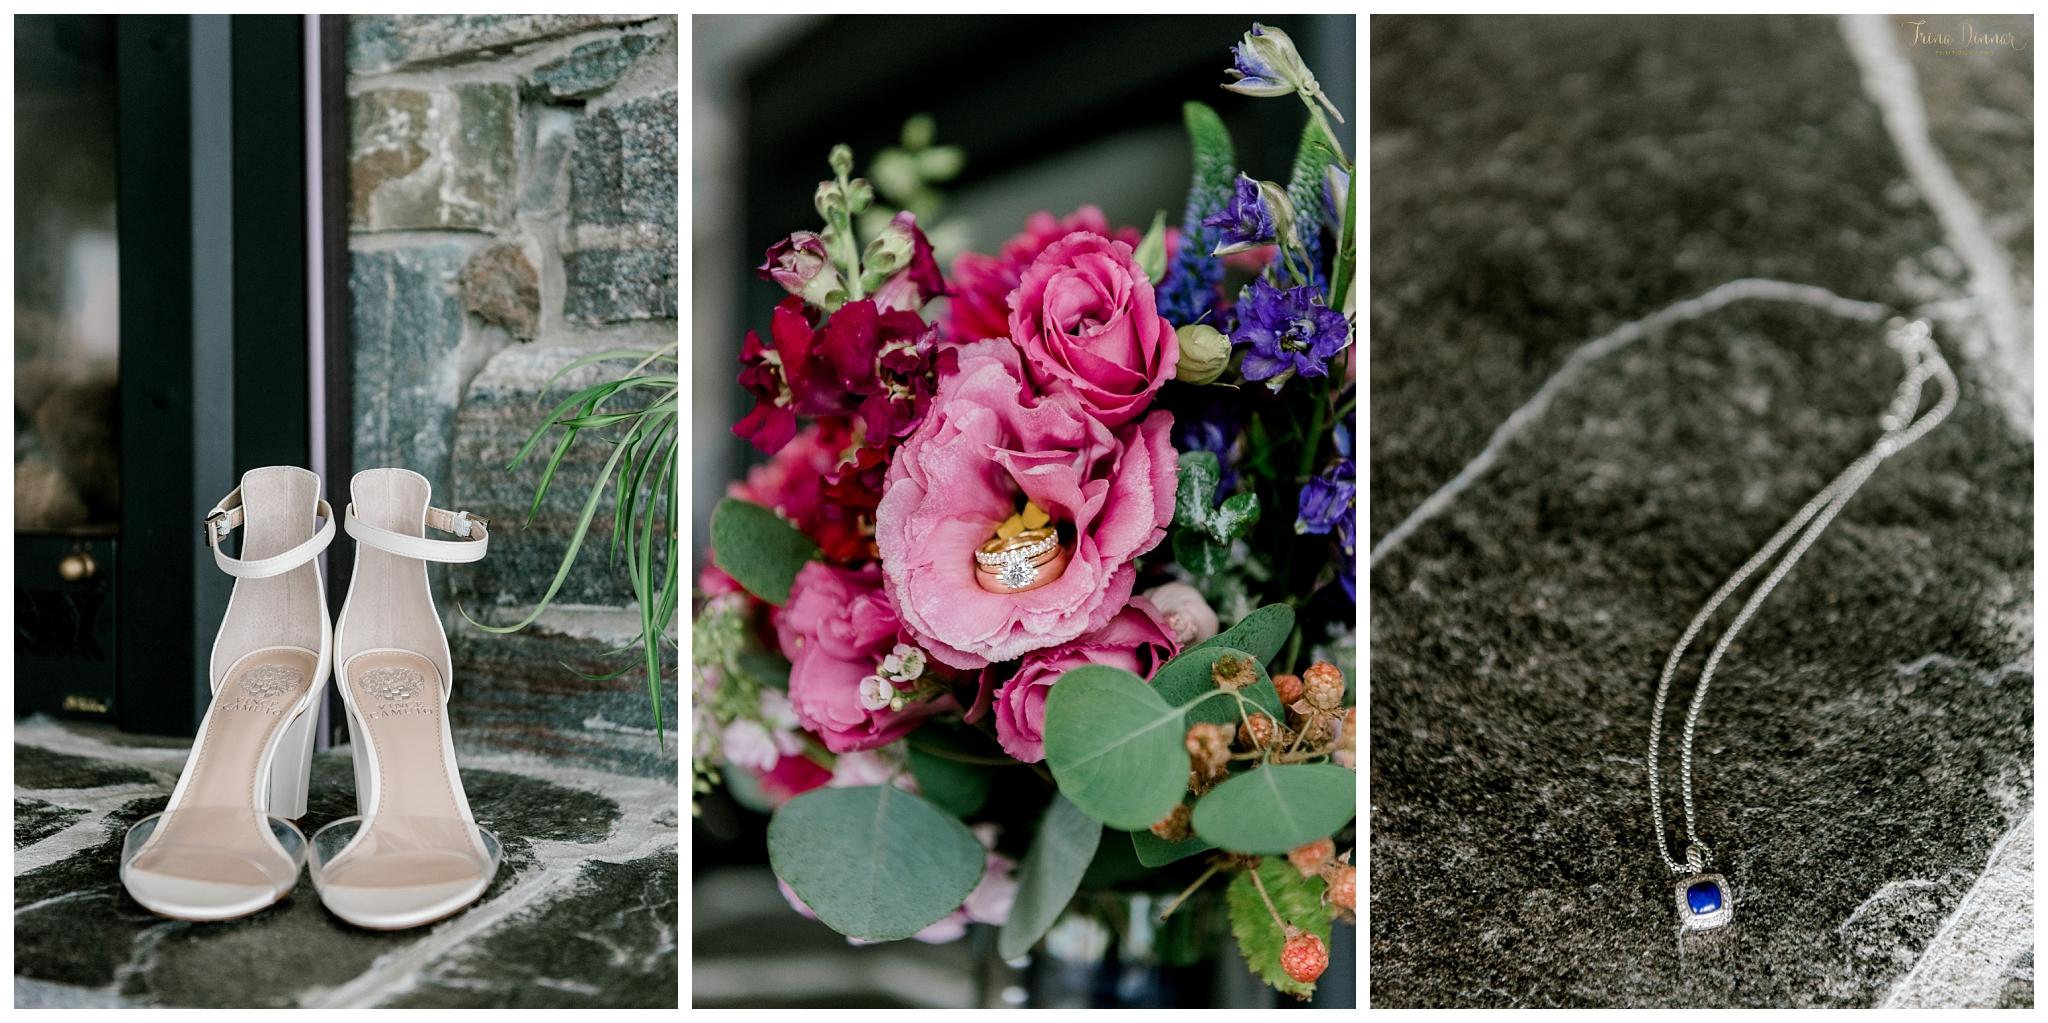 Dramatic Wedding Detail Photo Collage